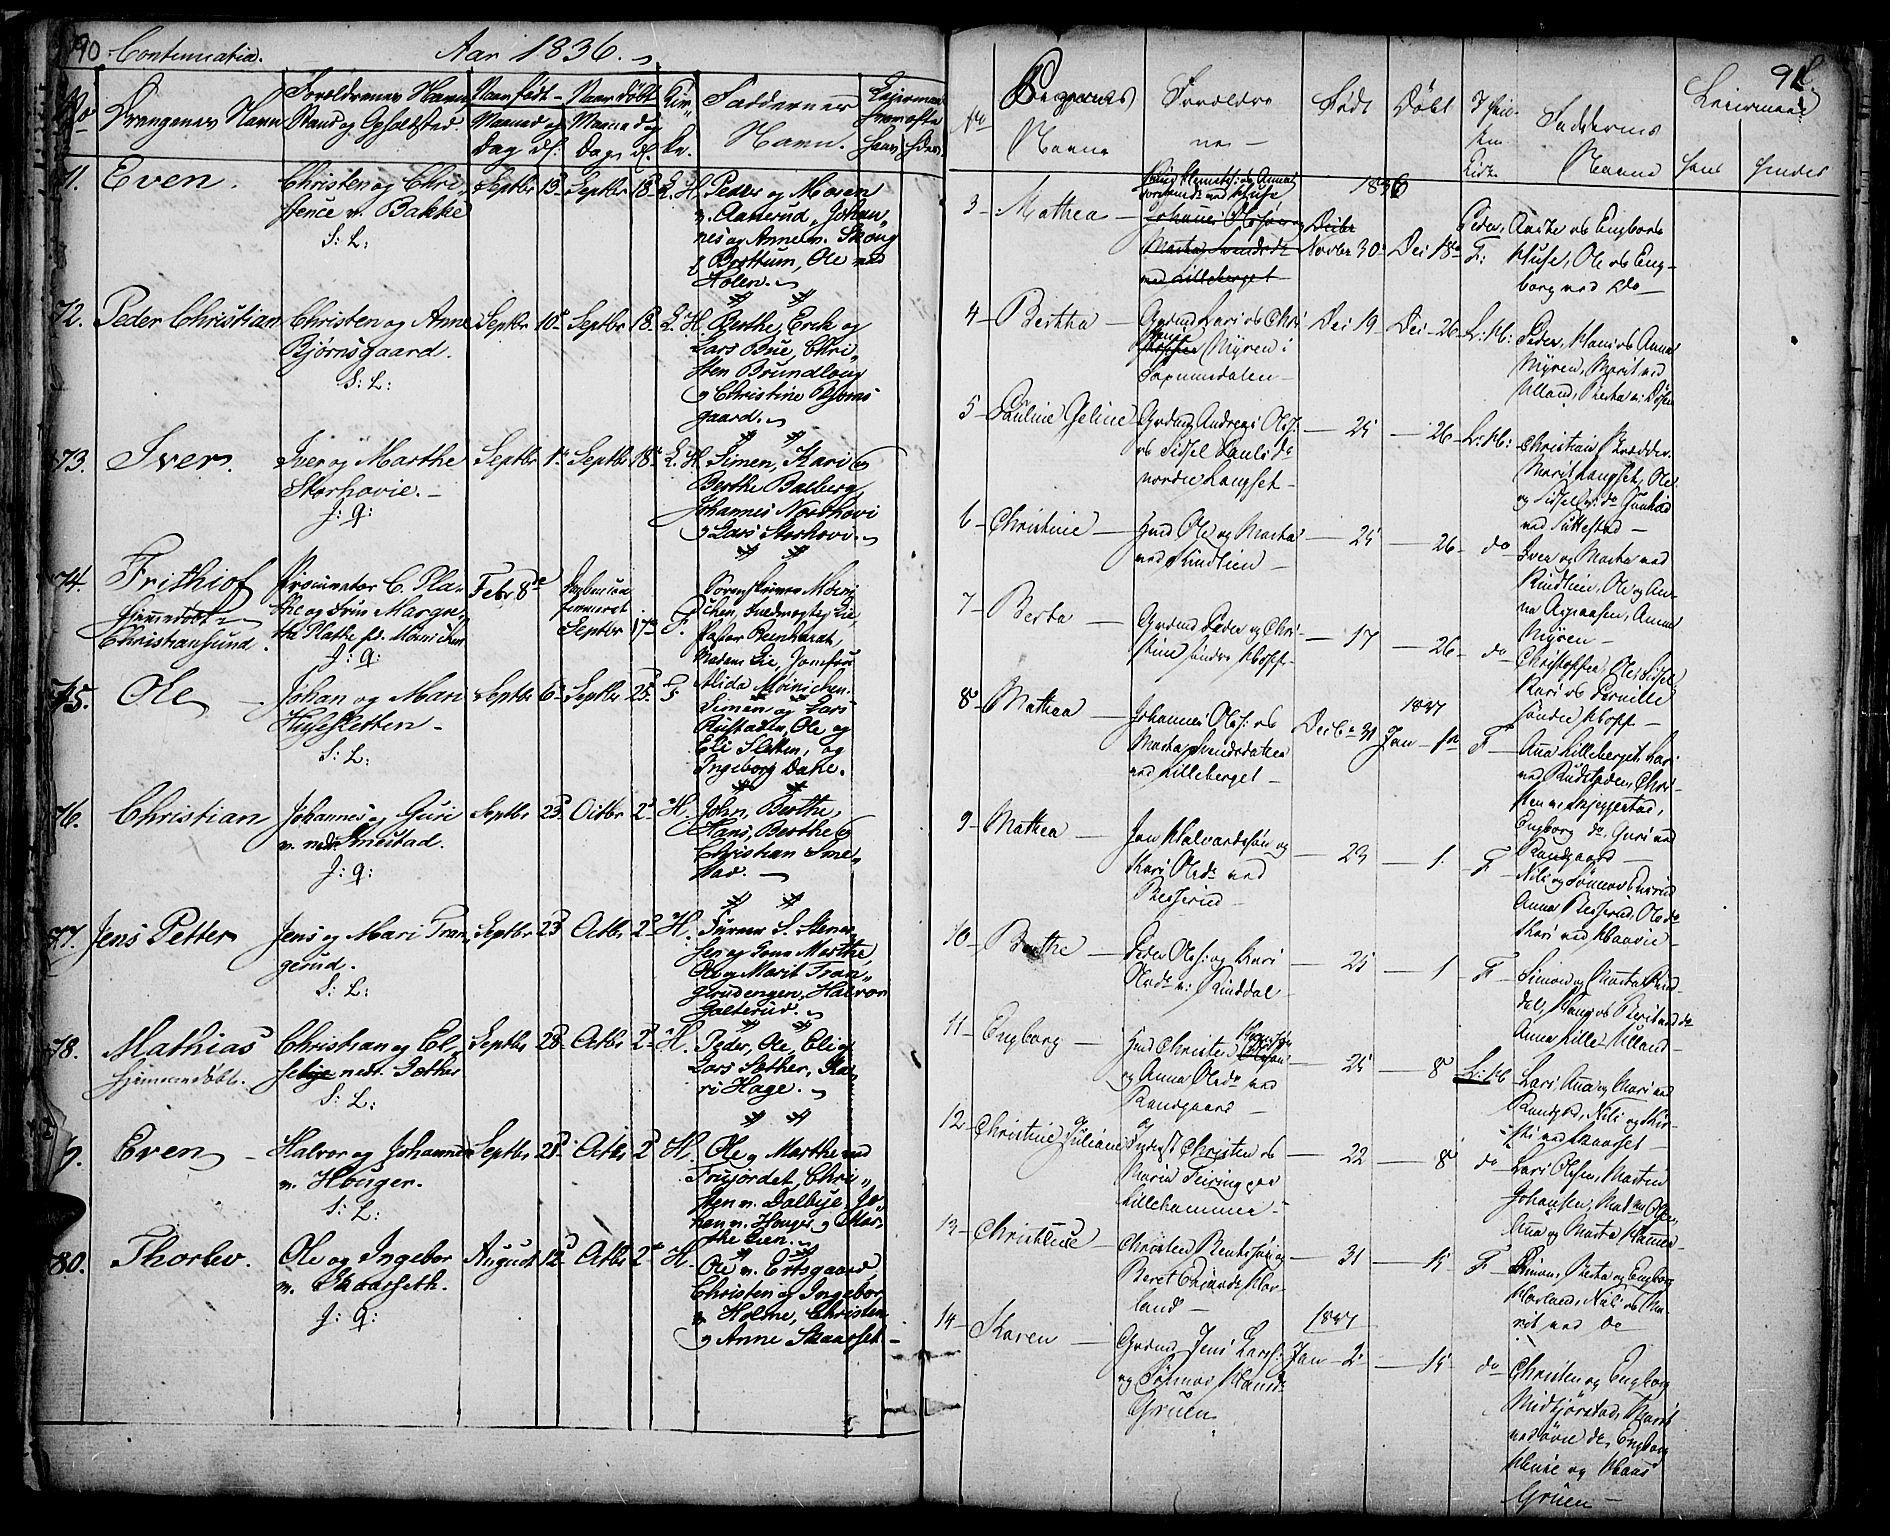 SAH, Fåberg prestekontor, Ministerialbok nr. 4, 1833-1837, s. 90-91